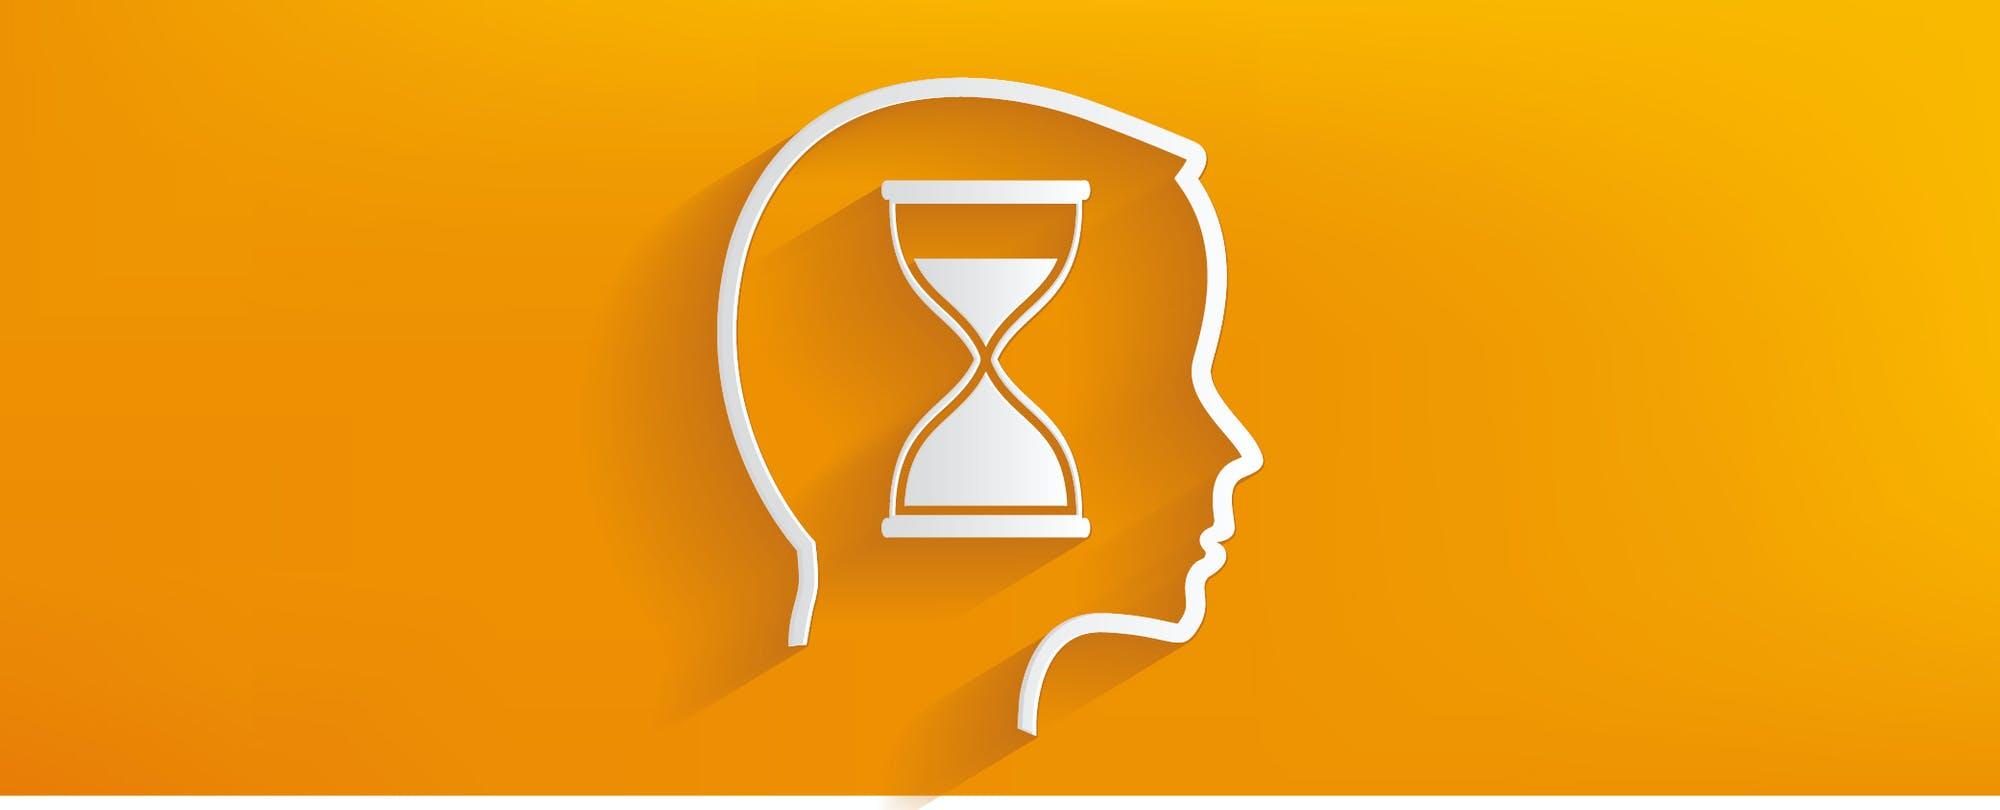 How Can Edtech Close the Book on Summer Brain Drain?